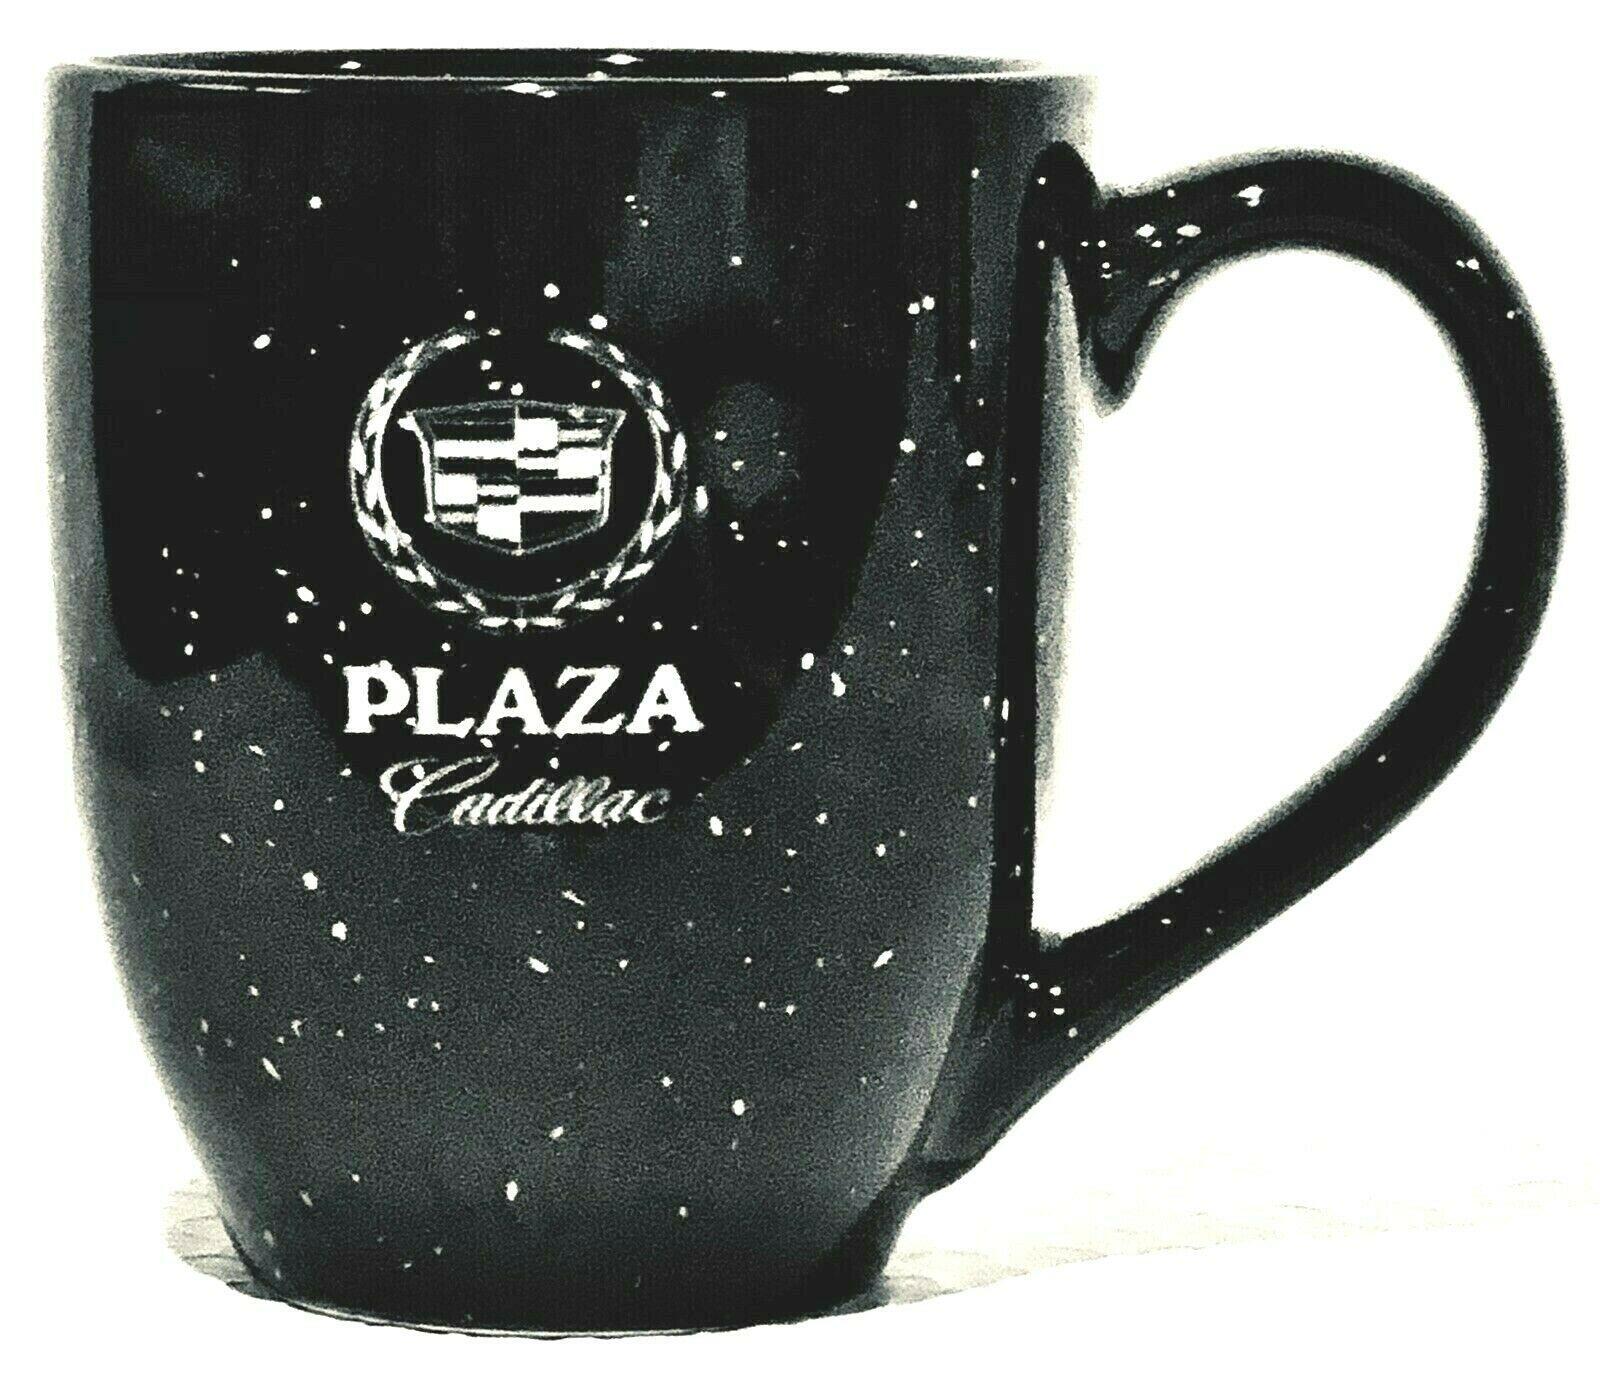 CADILLAC Large Coffee Cup Mug 16 oz PLAZA Cadillac Black Speckled - $19.99